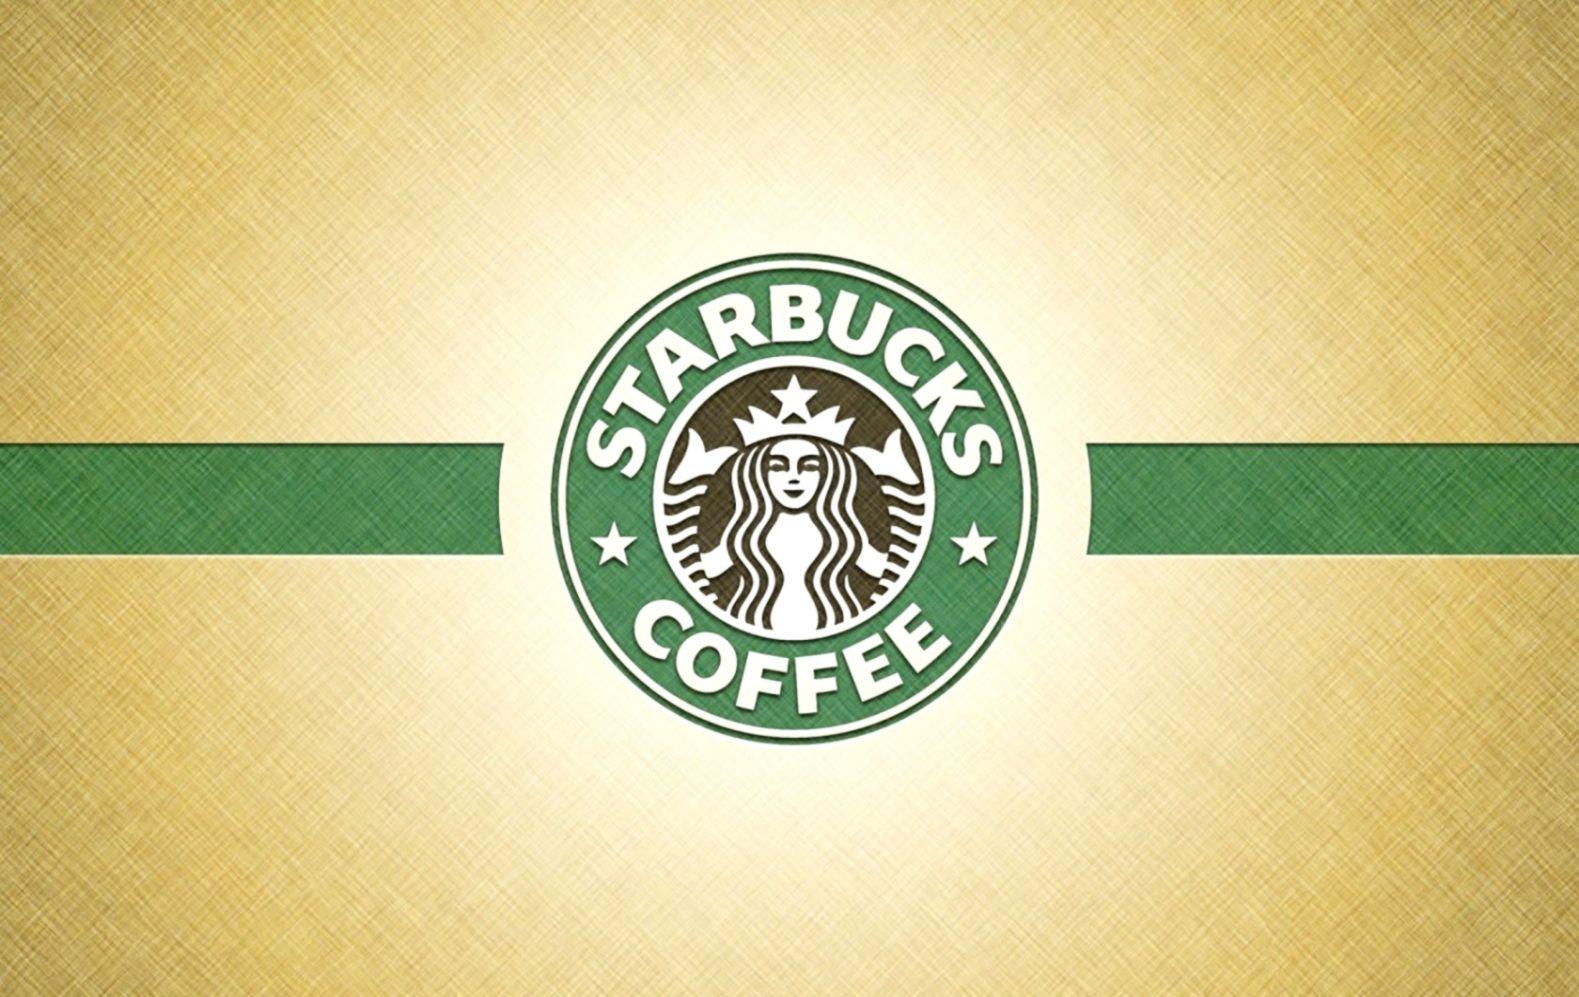 Art Logo Starbucks Coffee Hd Wallpaper Wallpapers Direct